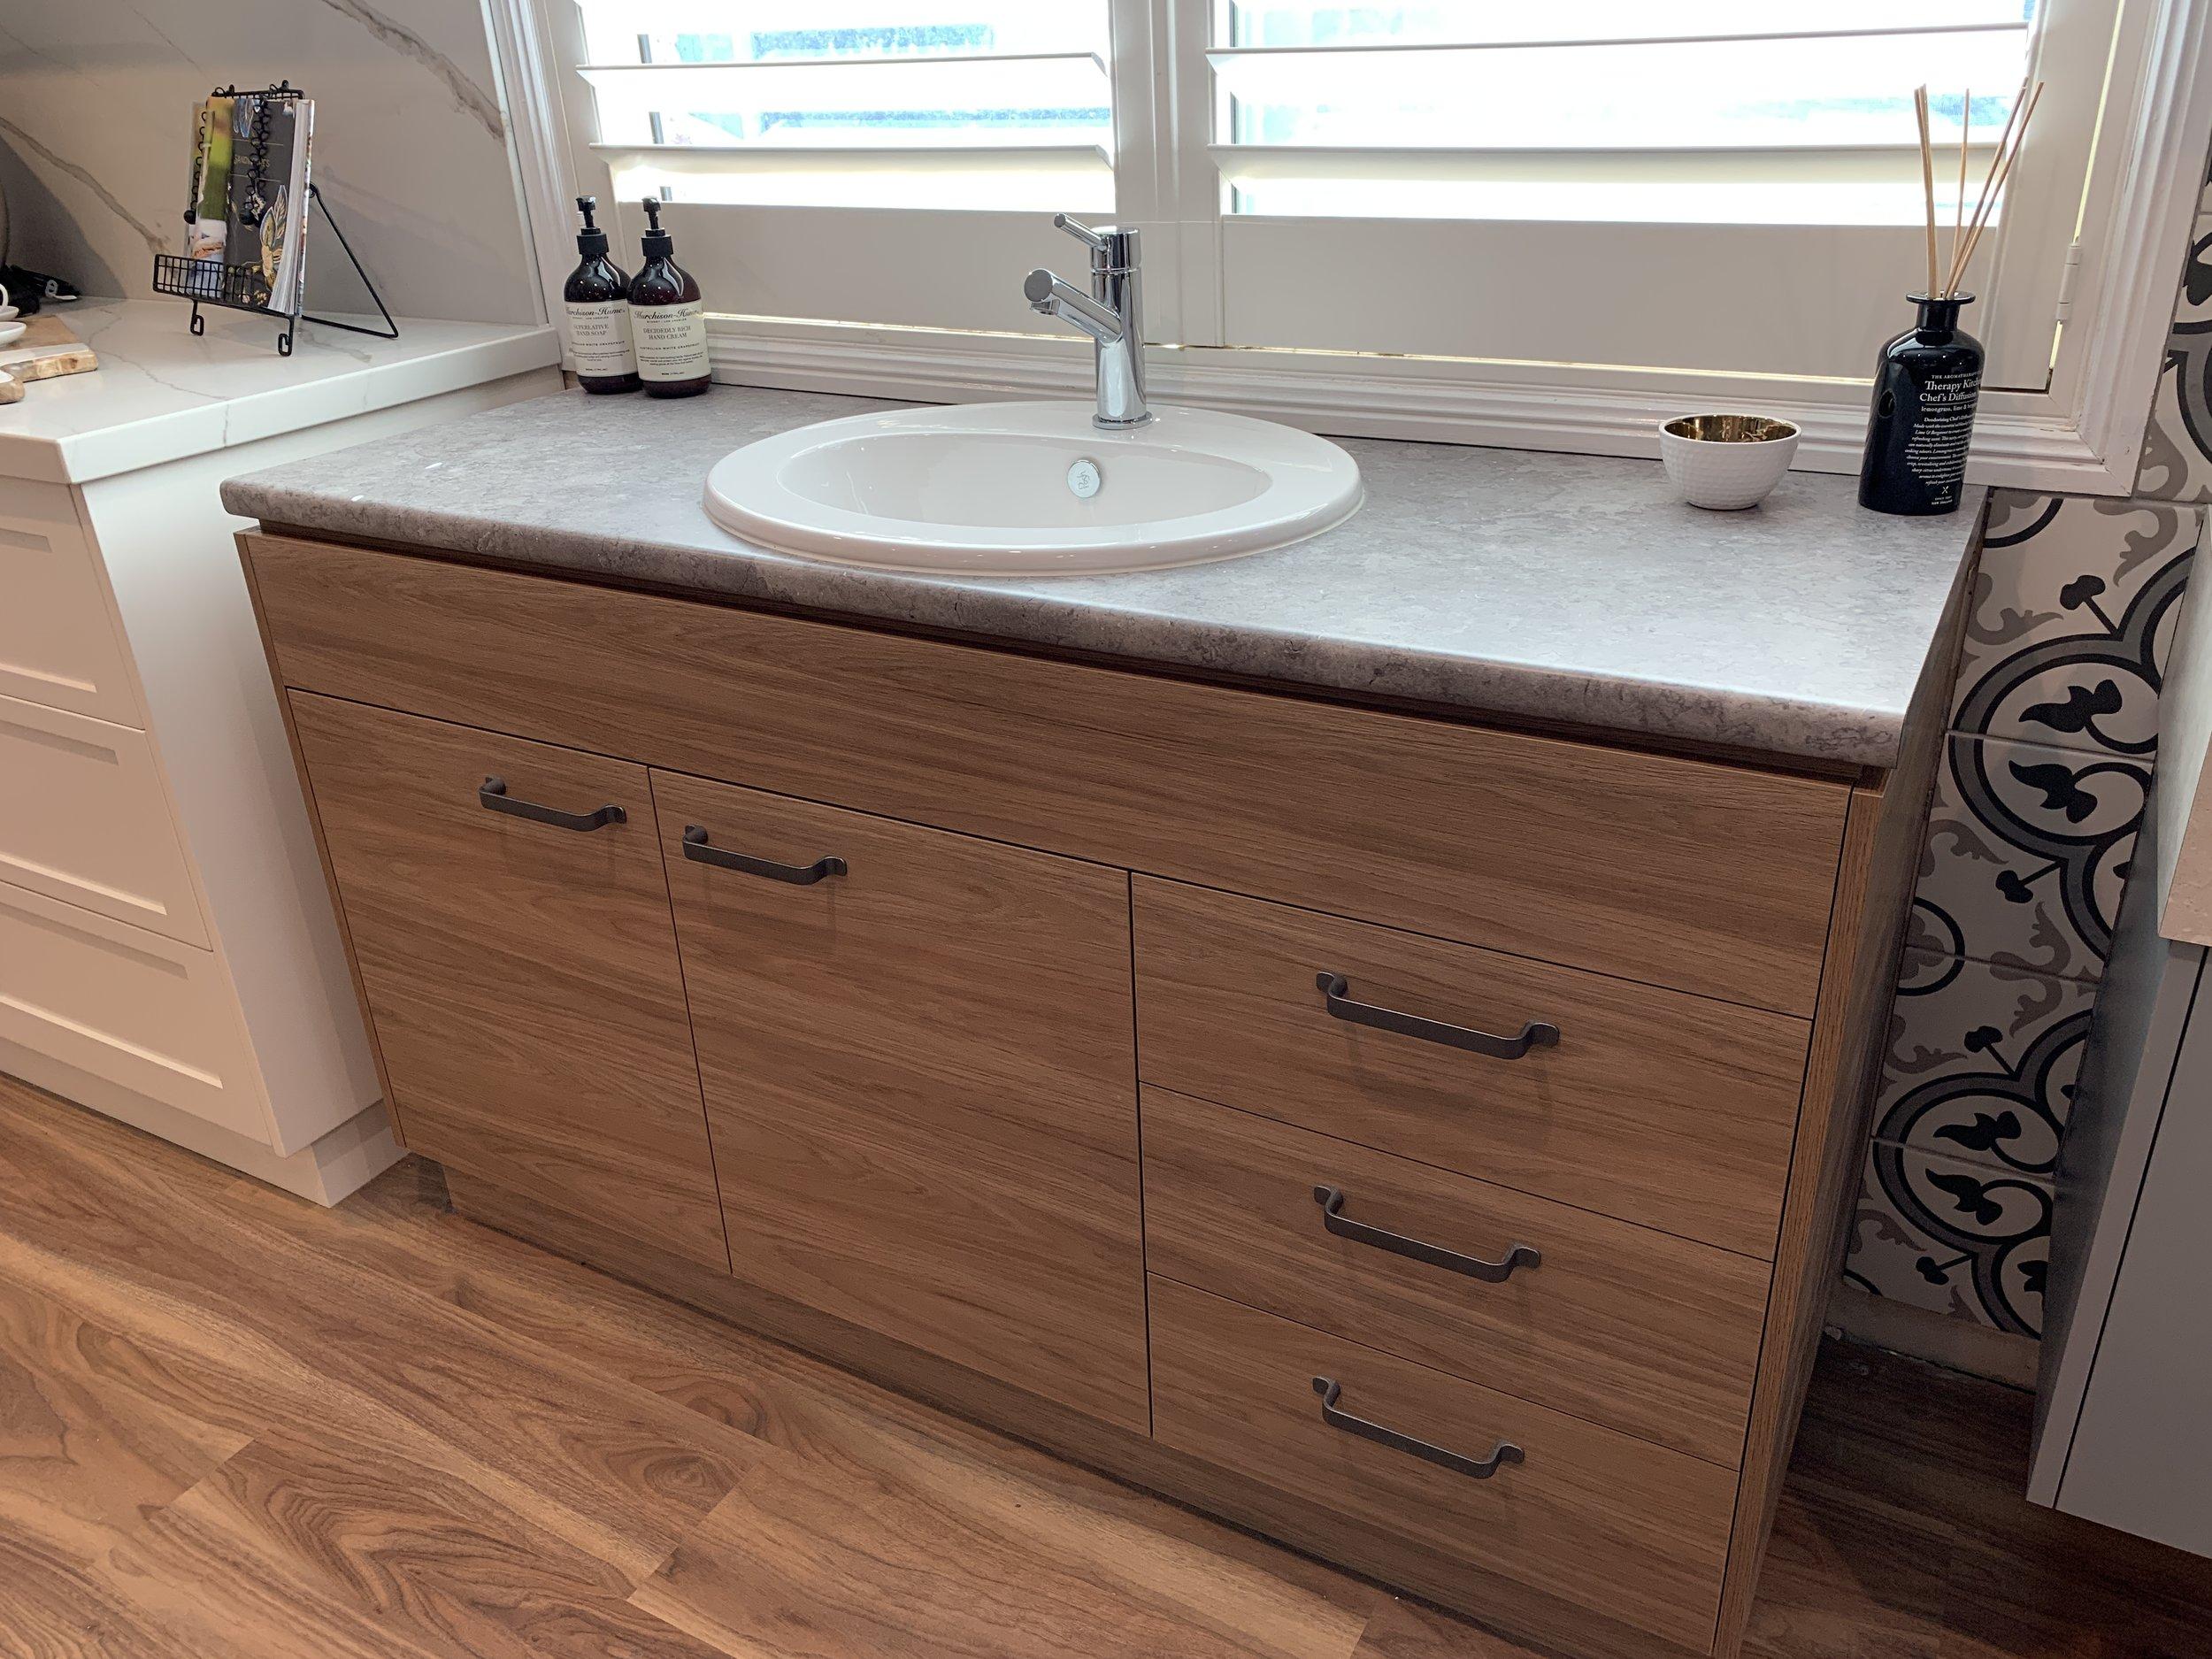 Drop In Vanity - Bench Top: Wilsonart Benjamin Grey (10 x 10)Cupboards: Polytec Prime Oak WoodmattHandles: Kethy L833 165 Rustic Grey Finish